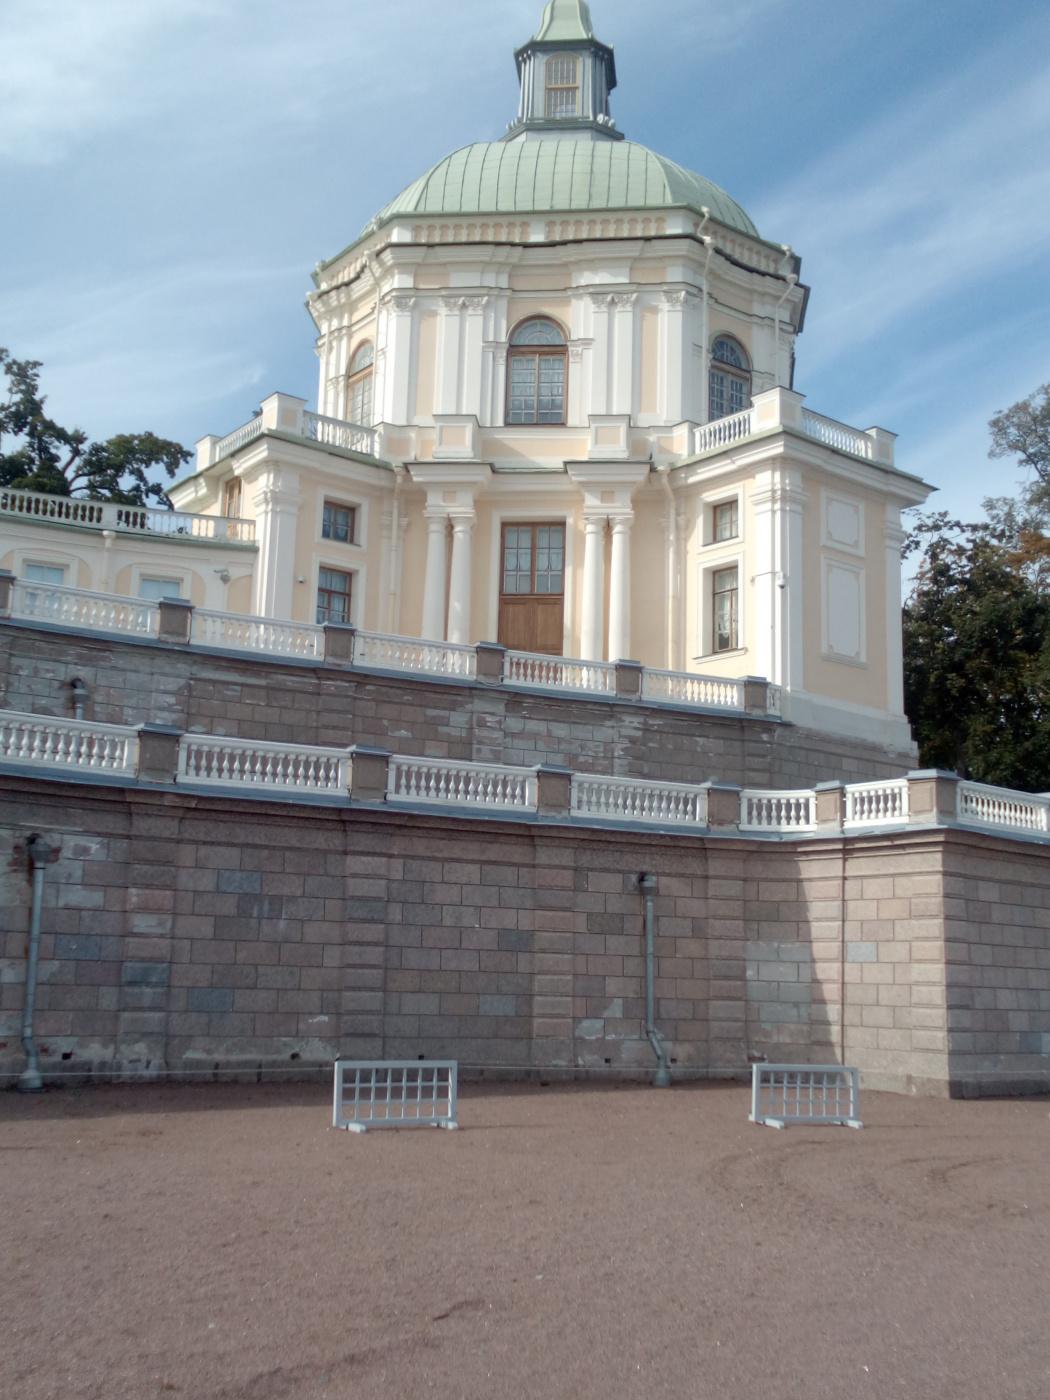 Алексей Гришанков (Alegri). Grand Palace. West Pavilion. Oranienbaum